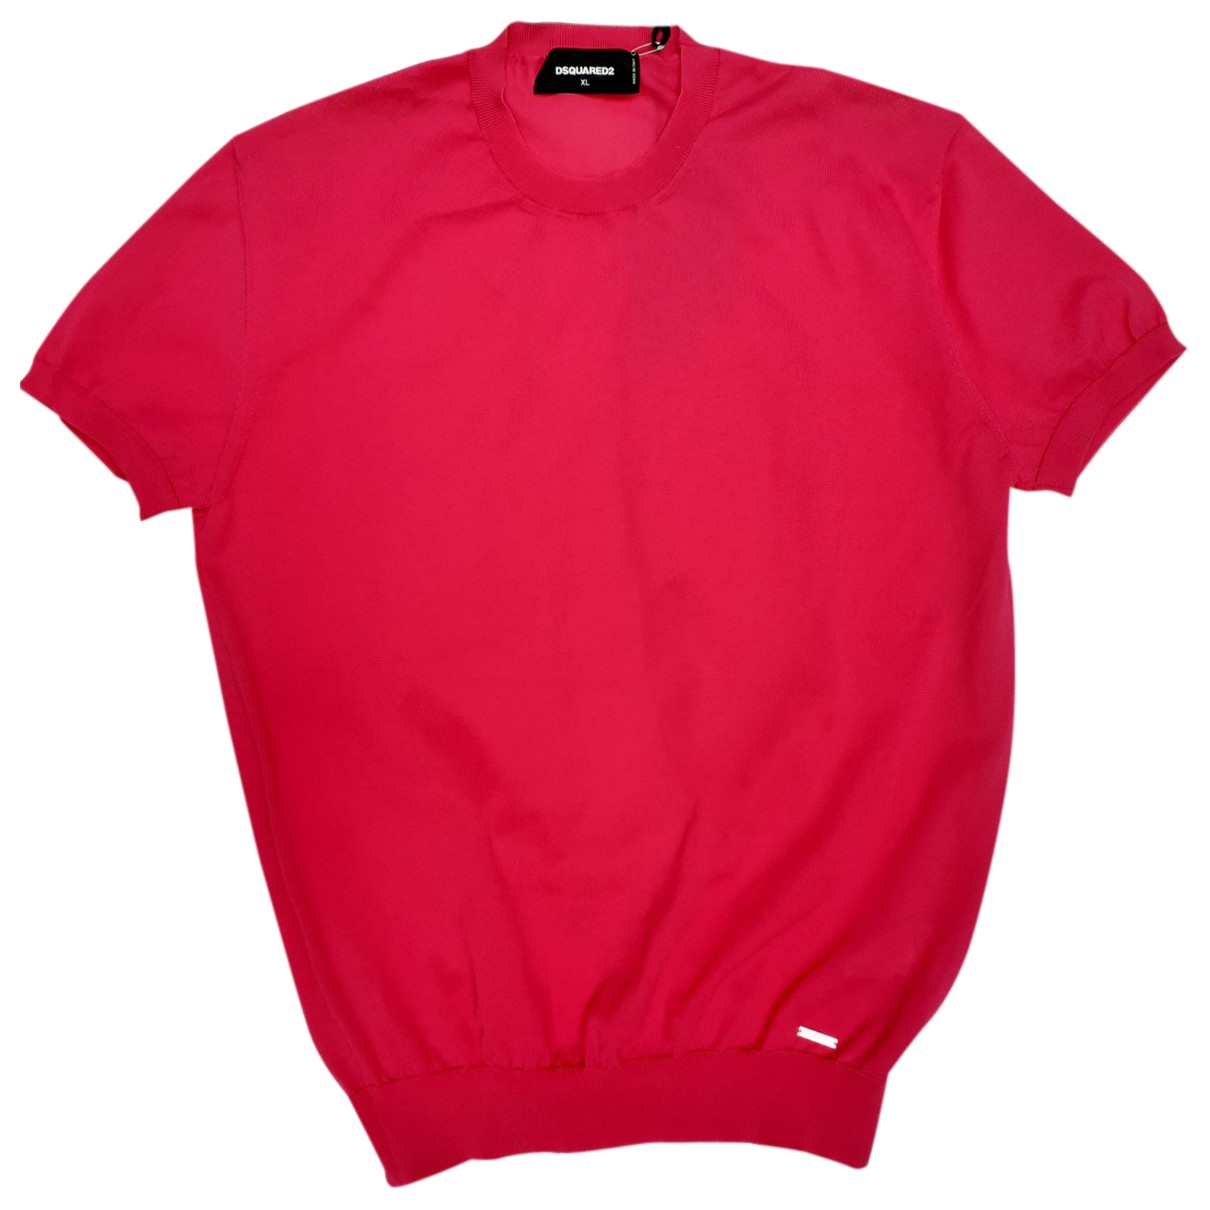 Dsquared2 N Knitwear & Sweatshirts for Men XL International